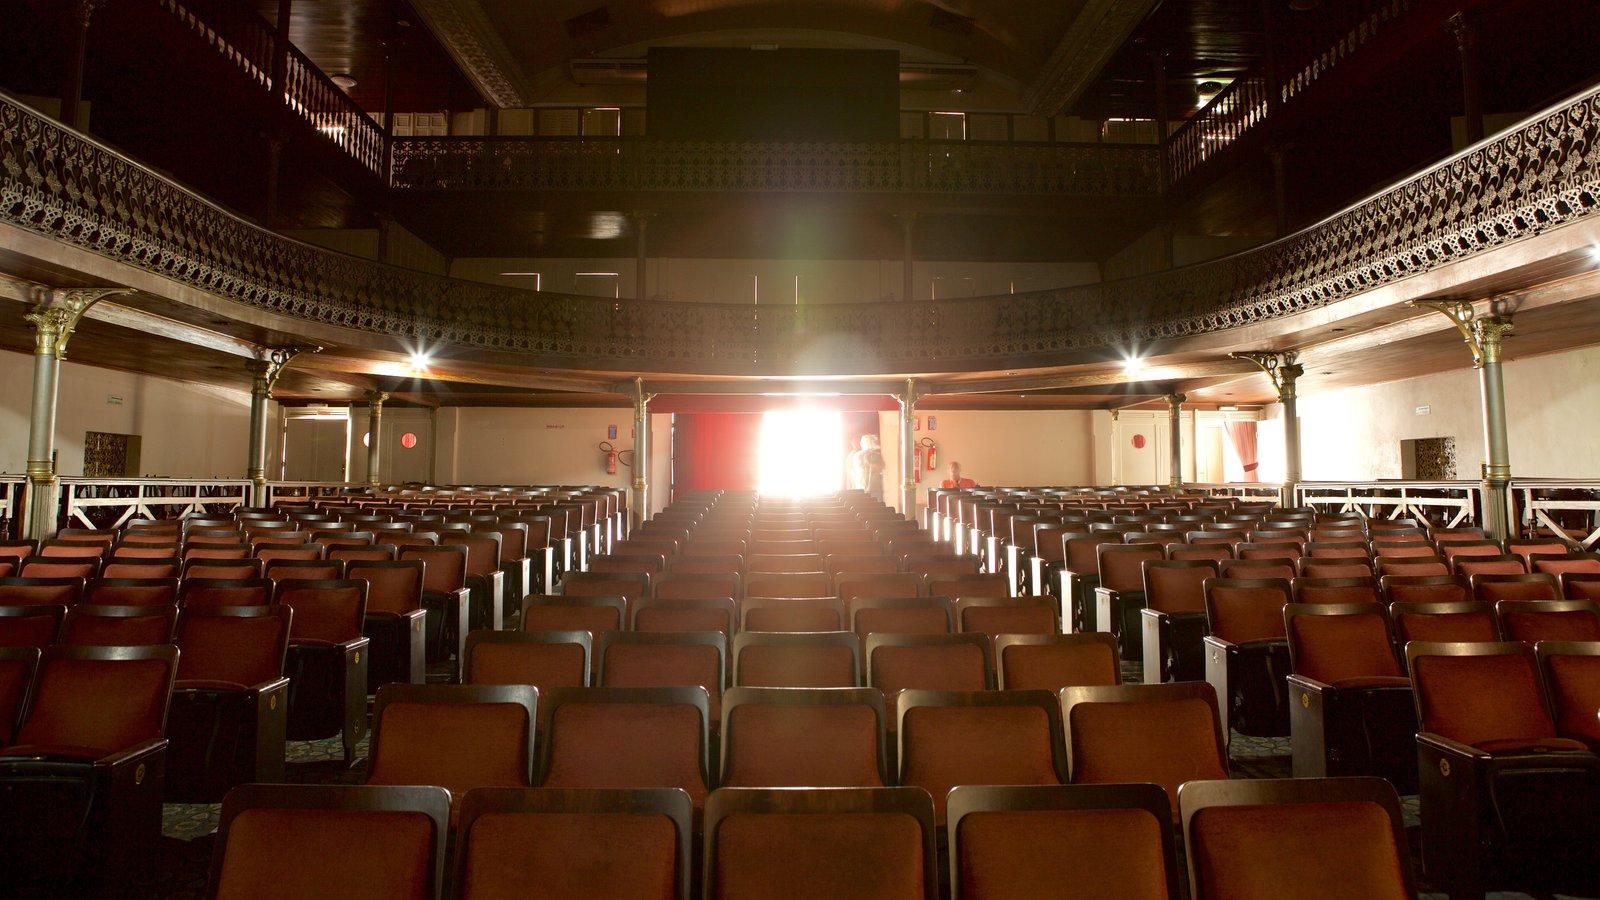 Teatro Alberto Maranhão caracterizando vistas internas, cenas de teatro e elementos de patrimônio